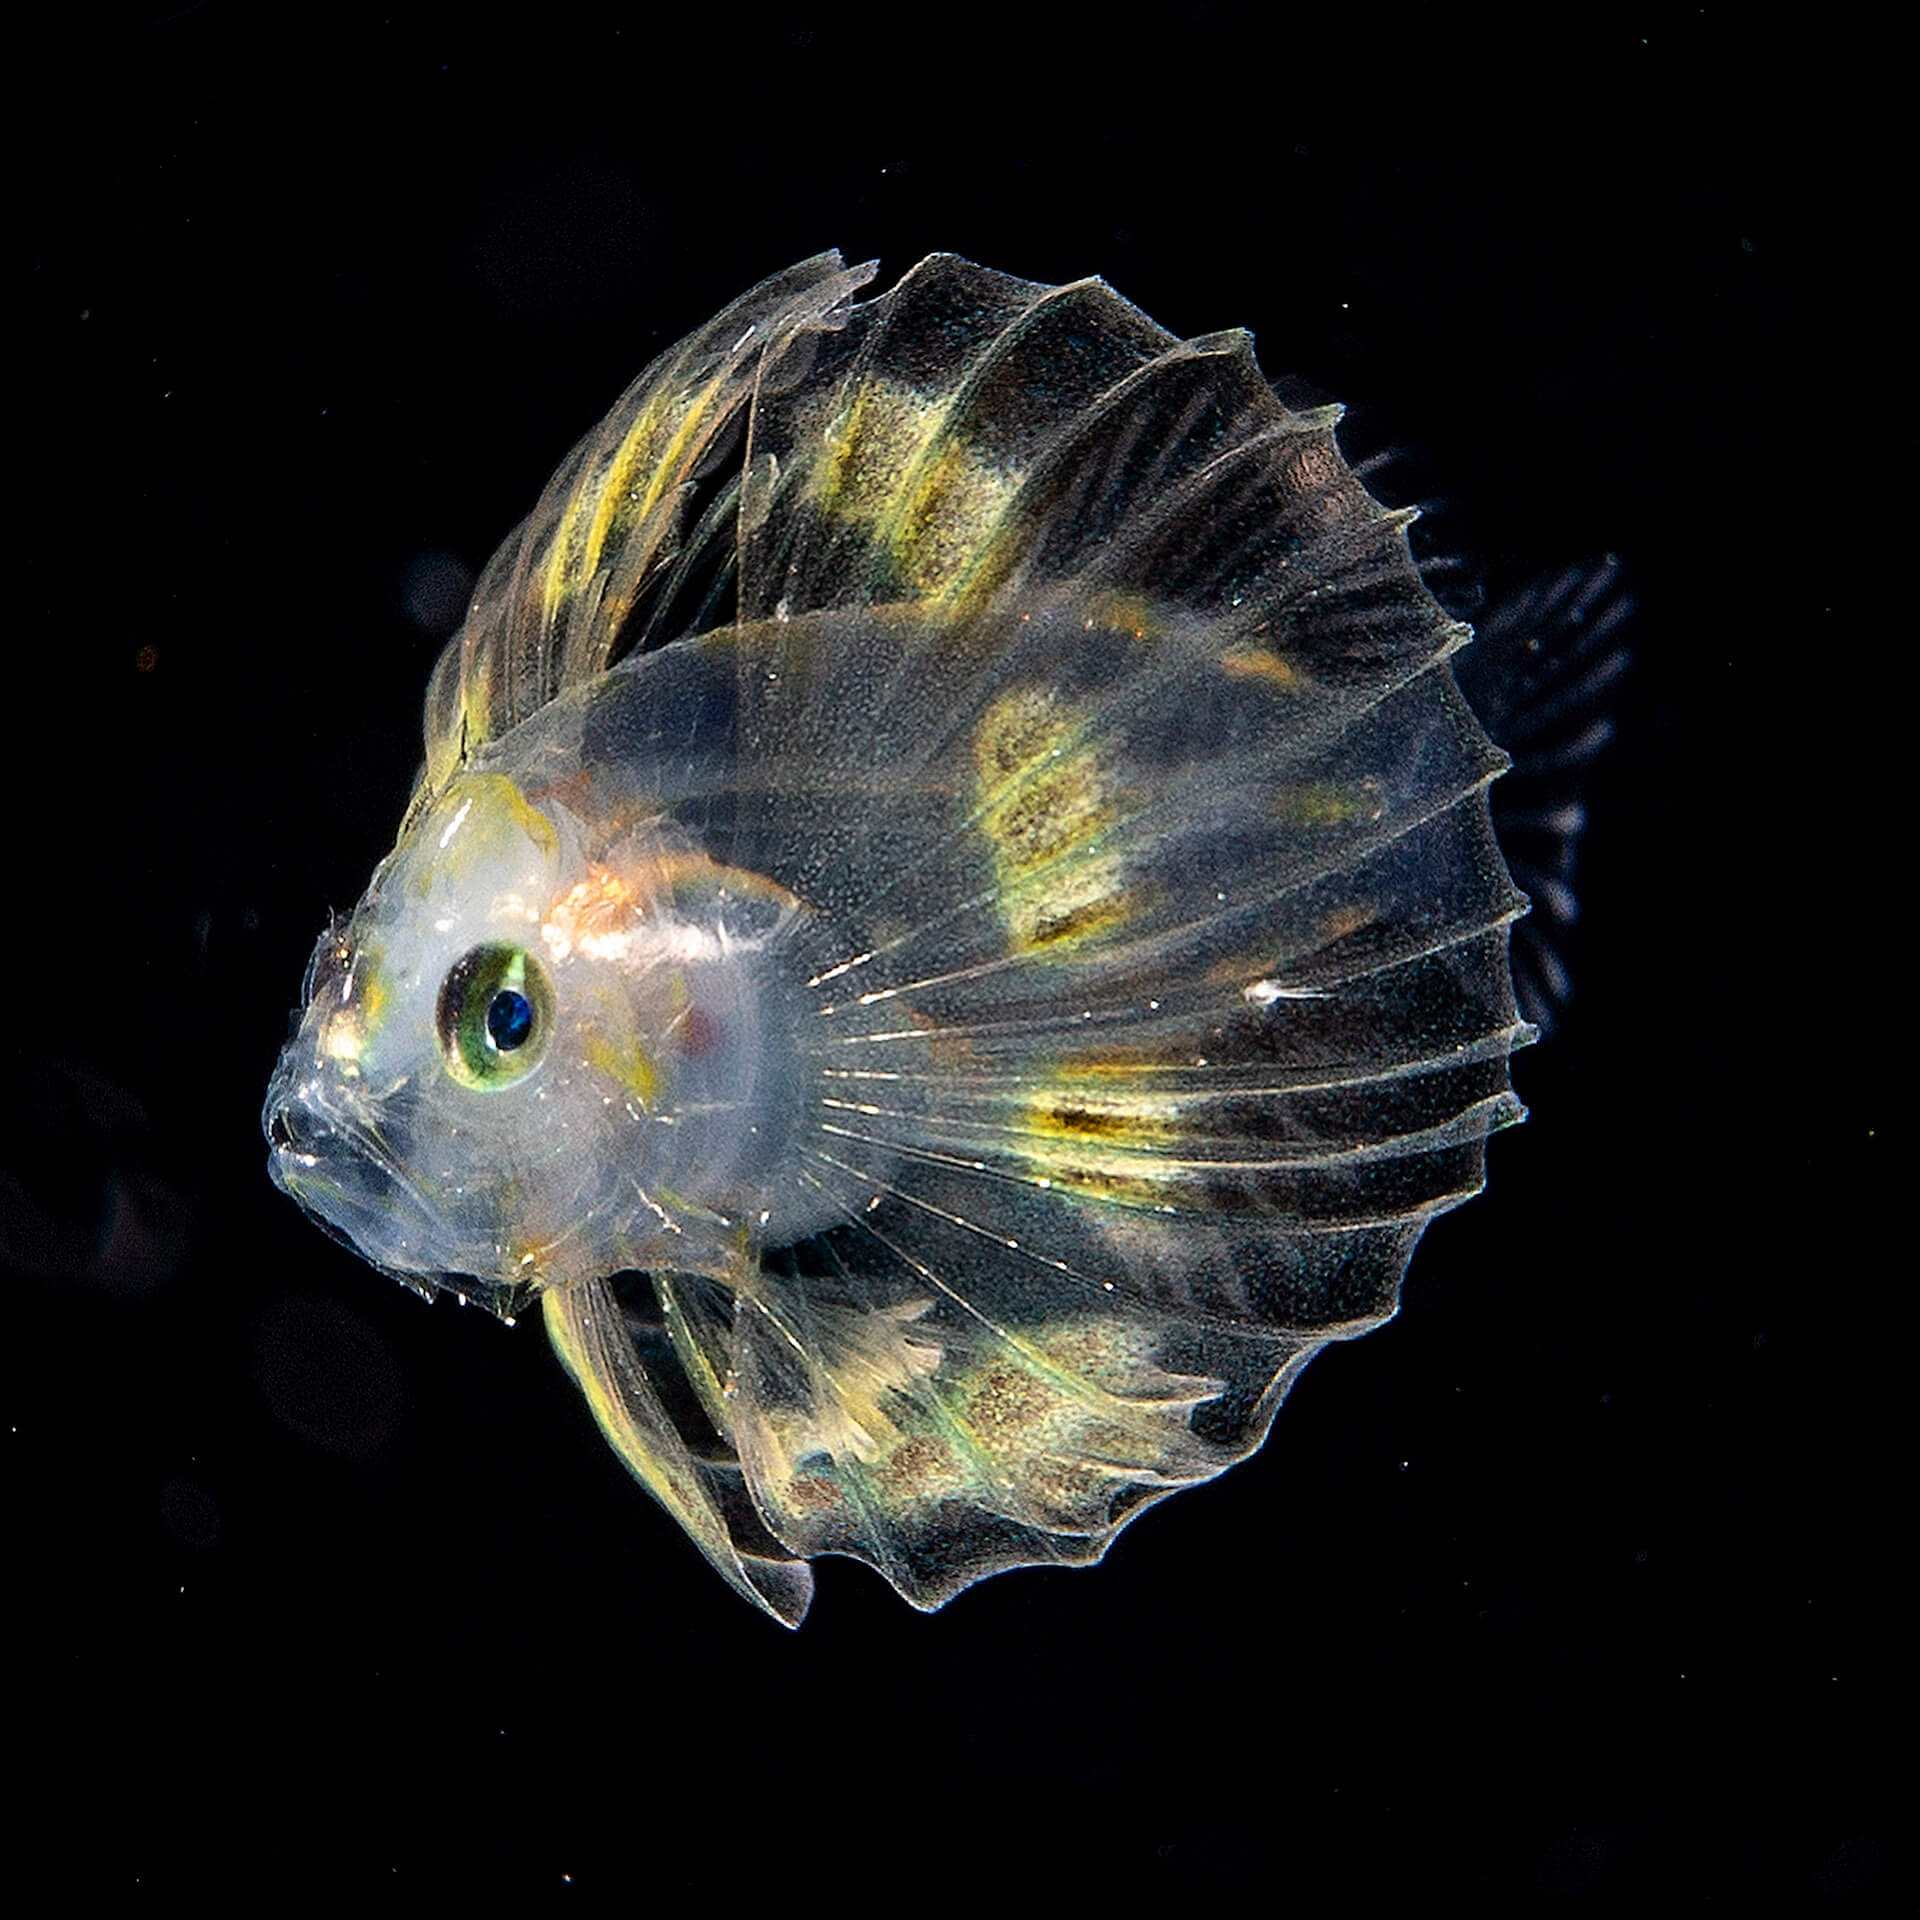 An Argonaut, also known as a paper nautilus